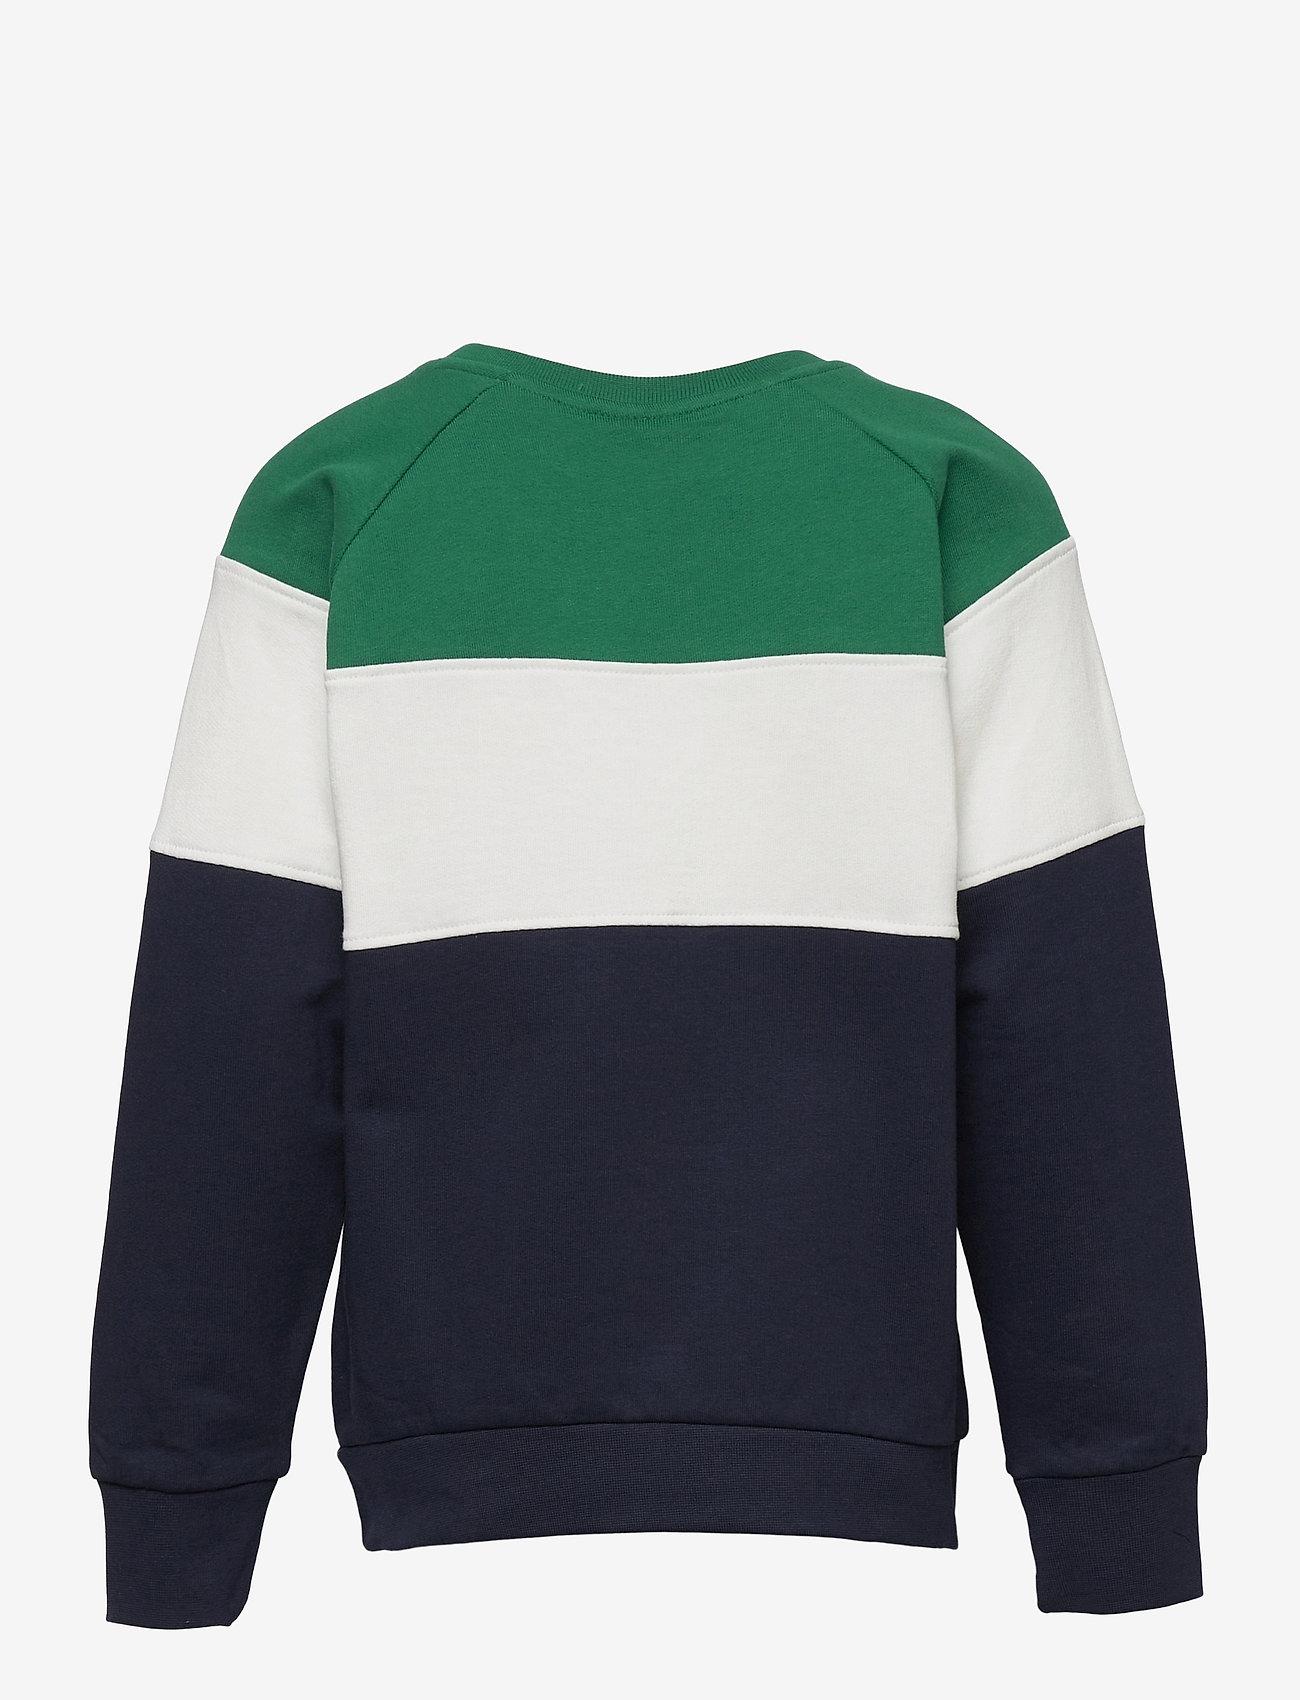 Hummel - hmlCLAES SWEATSHIRT - sweatshirts - ultramarine green - 1